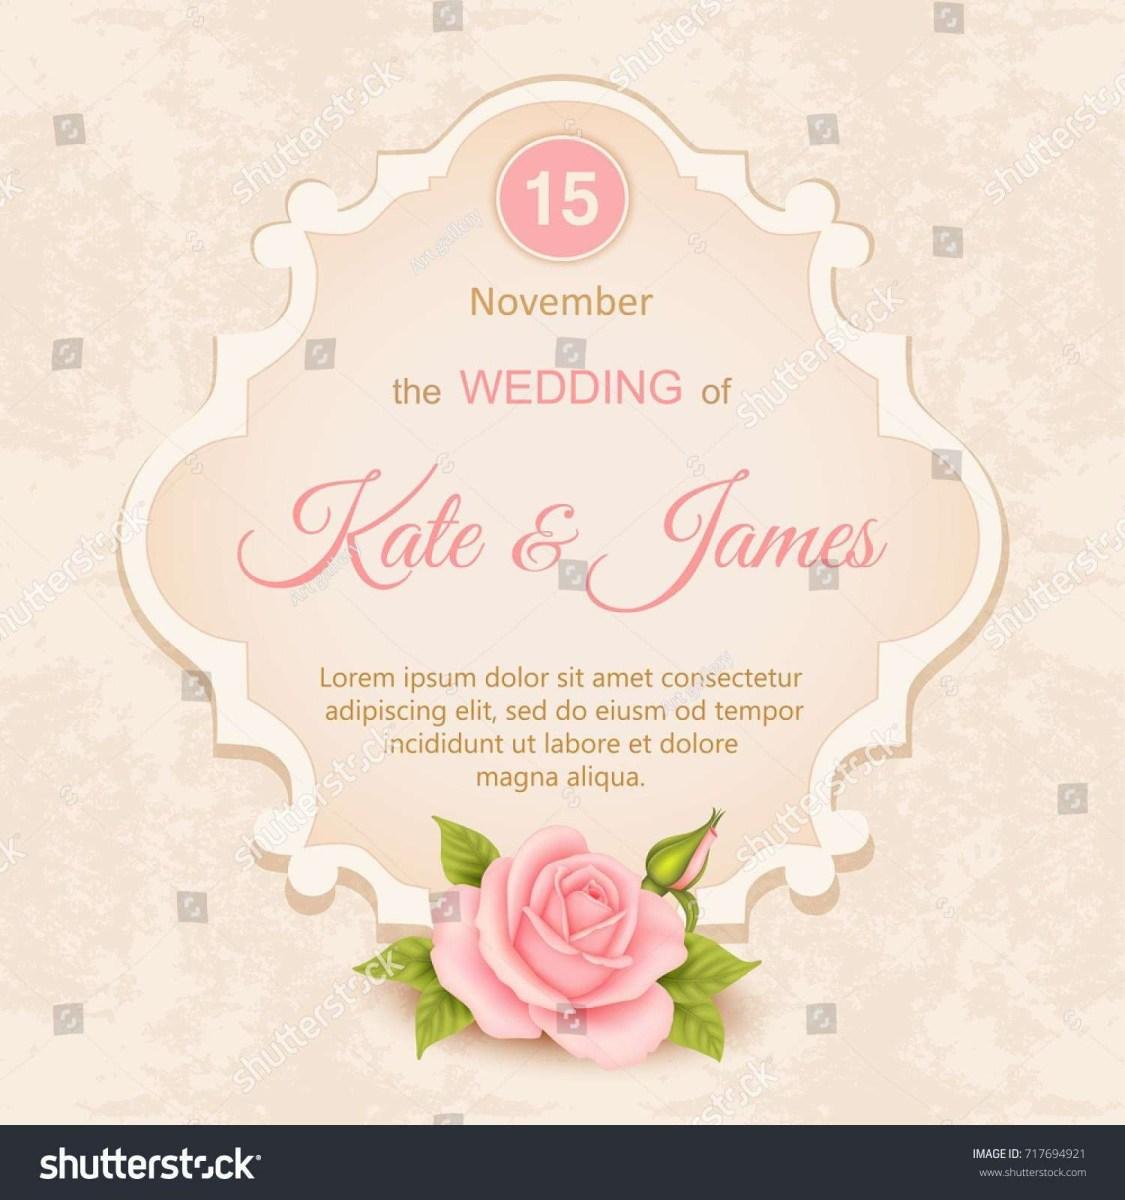 Muslim Wedding Invitations Elegant Wedding Invitations Templates Best Muslim Wedding Design